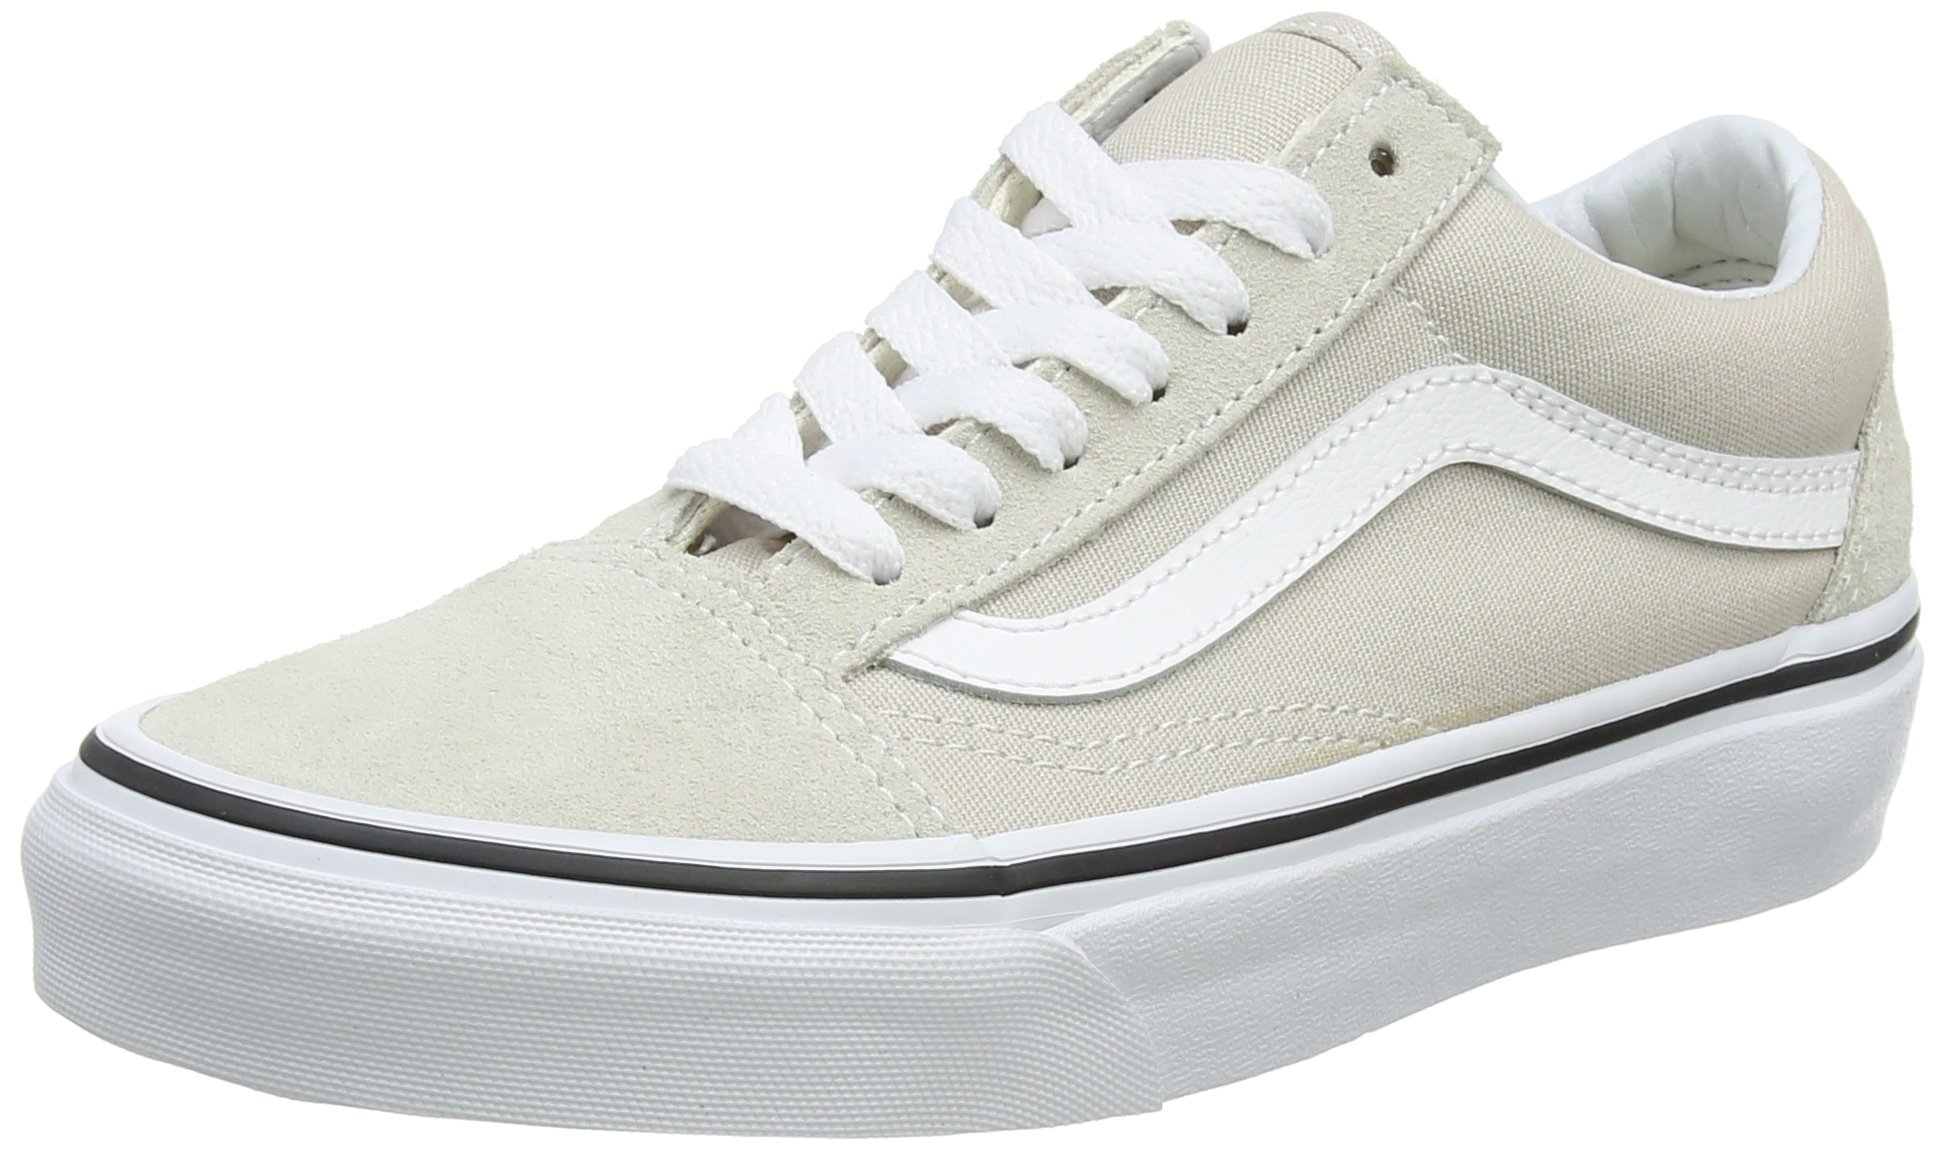 37af06678b Galleon - Vans Unisex Adults Old Skool Classic Suede Canvas Sneakers ...